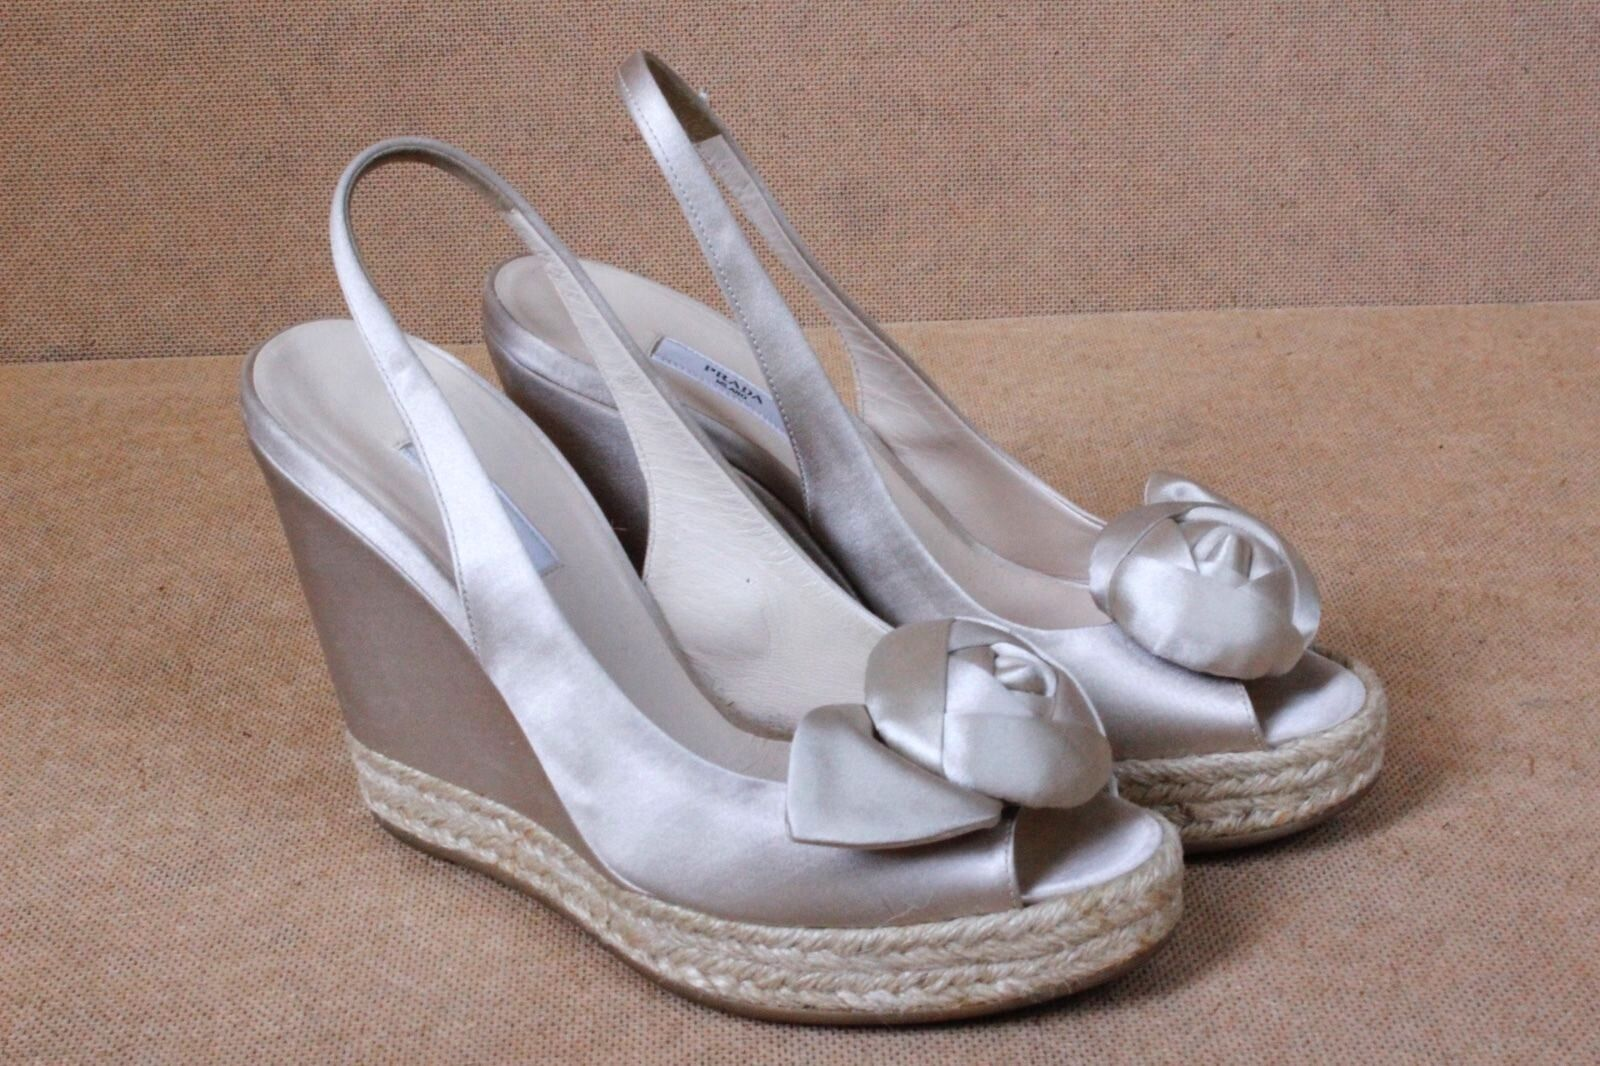 Prada Prada Prada cream satin wedges heels with flower 35.5 Uk 3.5 27c36e